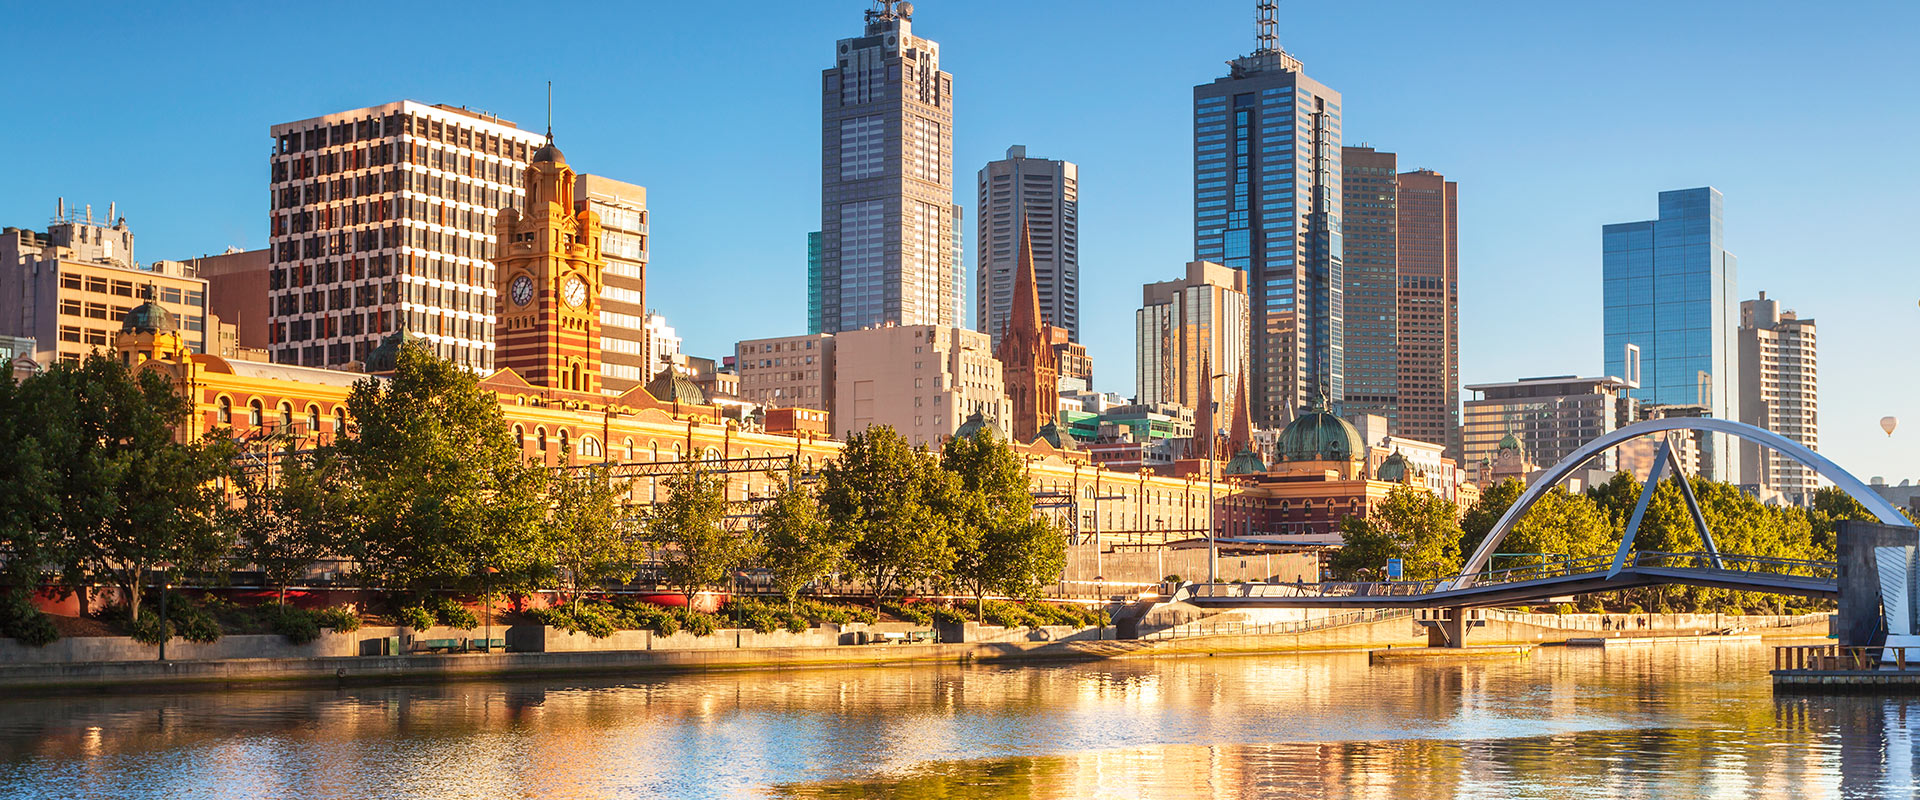 Bild Melbourne